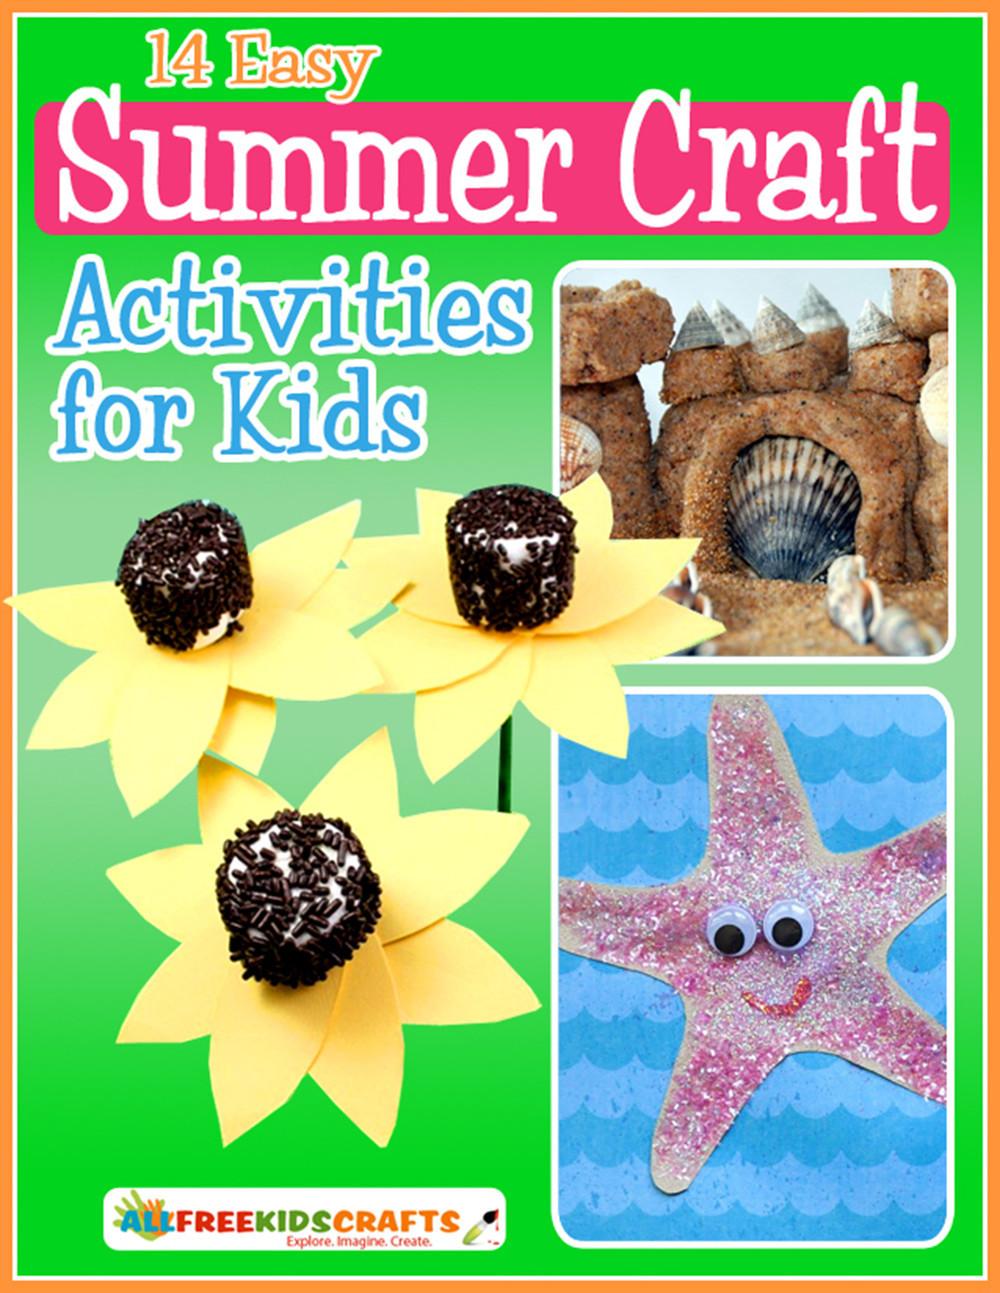 Summer Crafts For Children  14 Easy Summer Craft Activities for Kids Free eBook